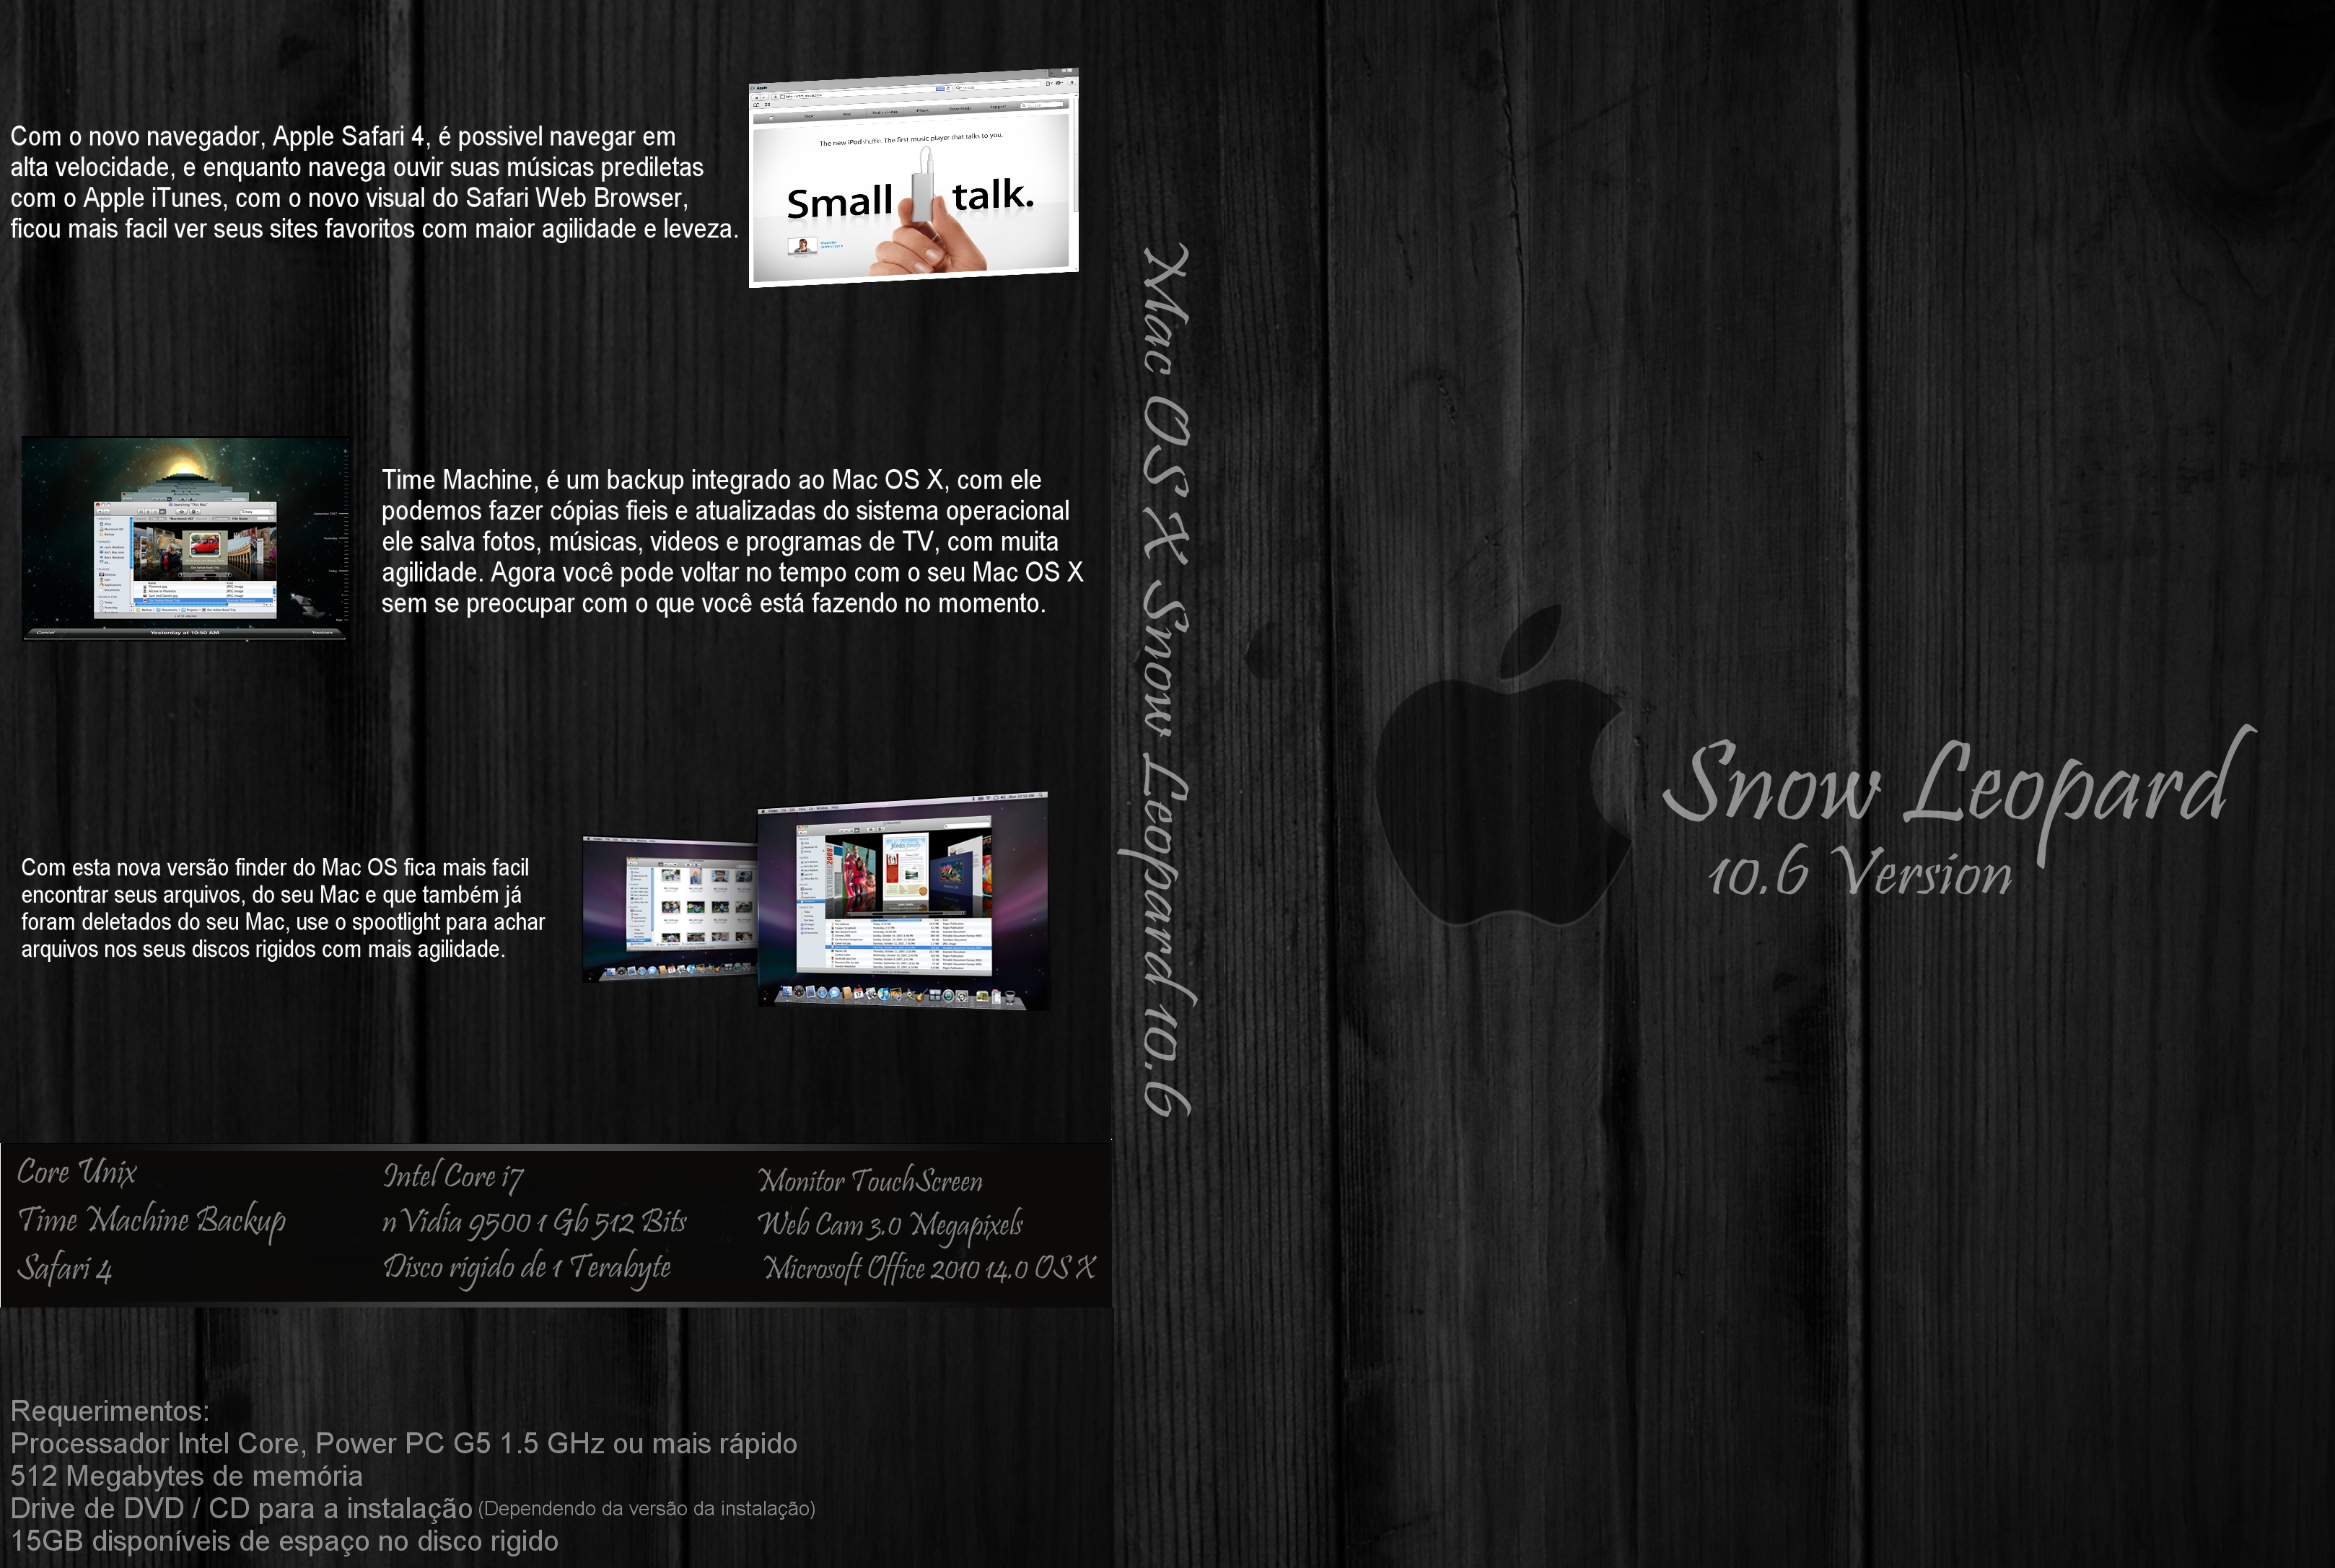 Mac OS X Snow Leopard 10.6 Box by feliipetaumaturgo